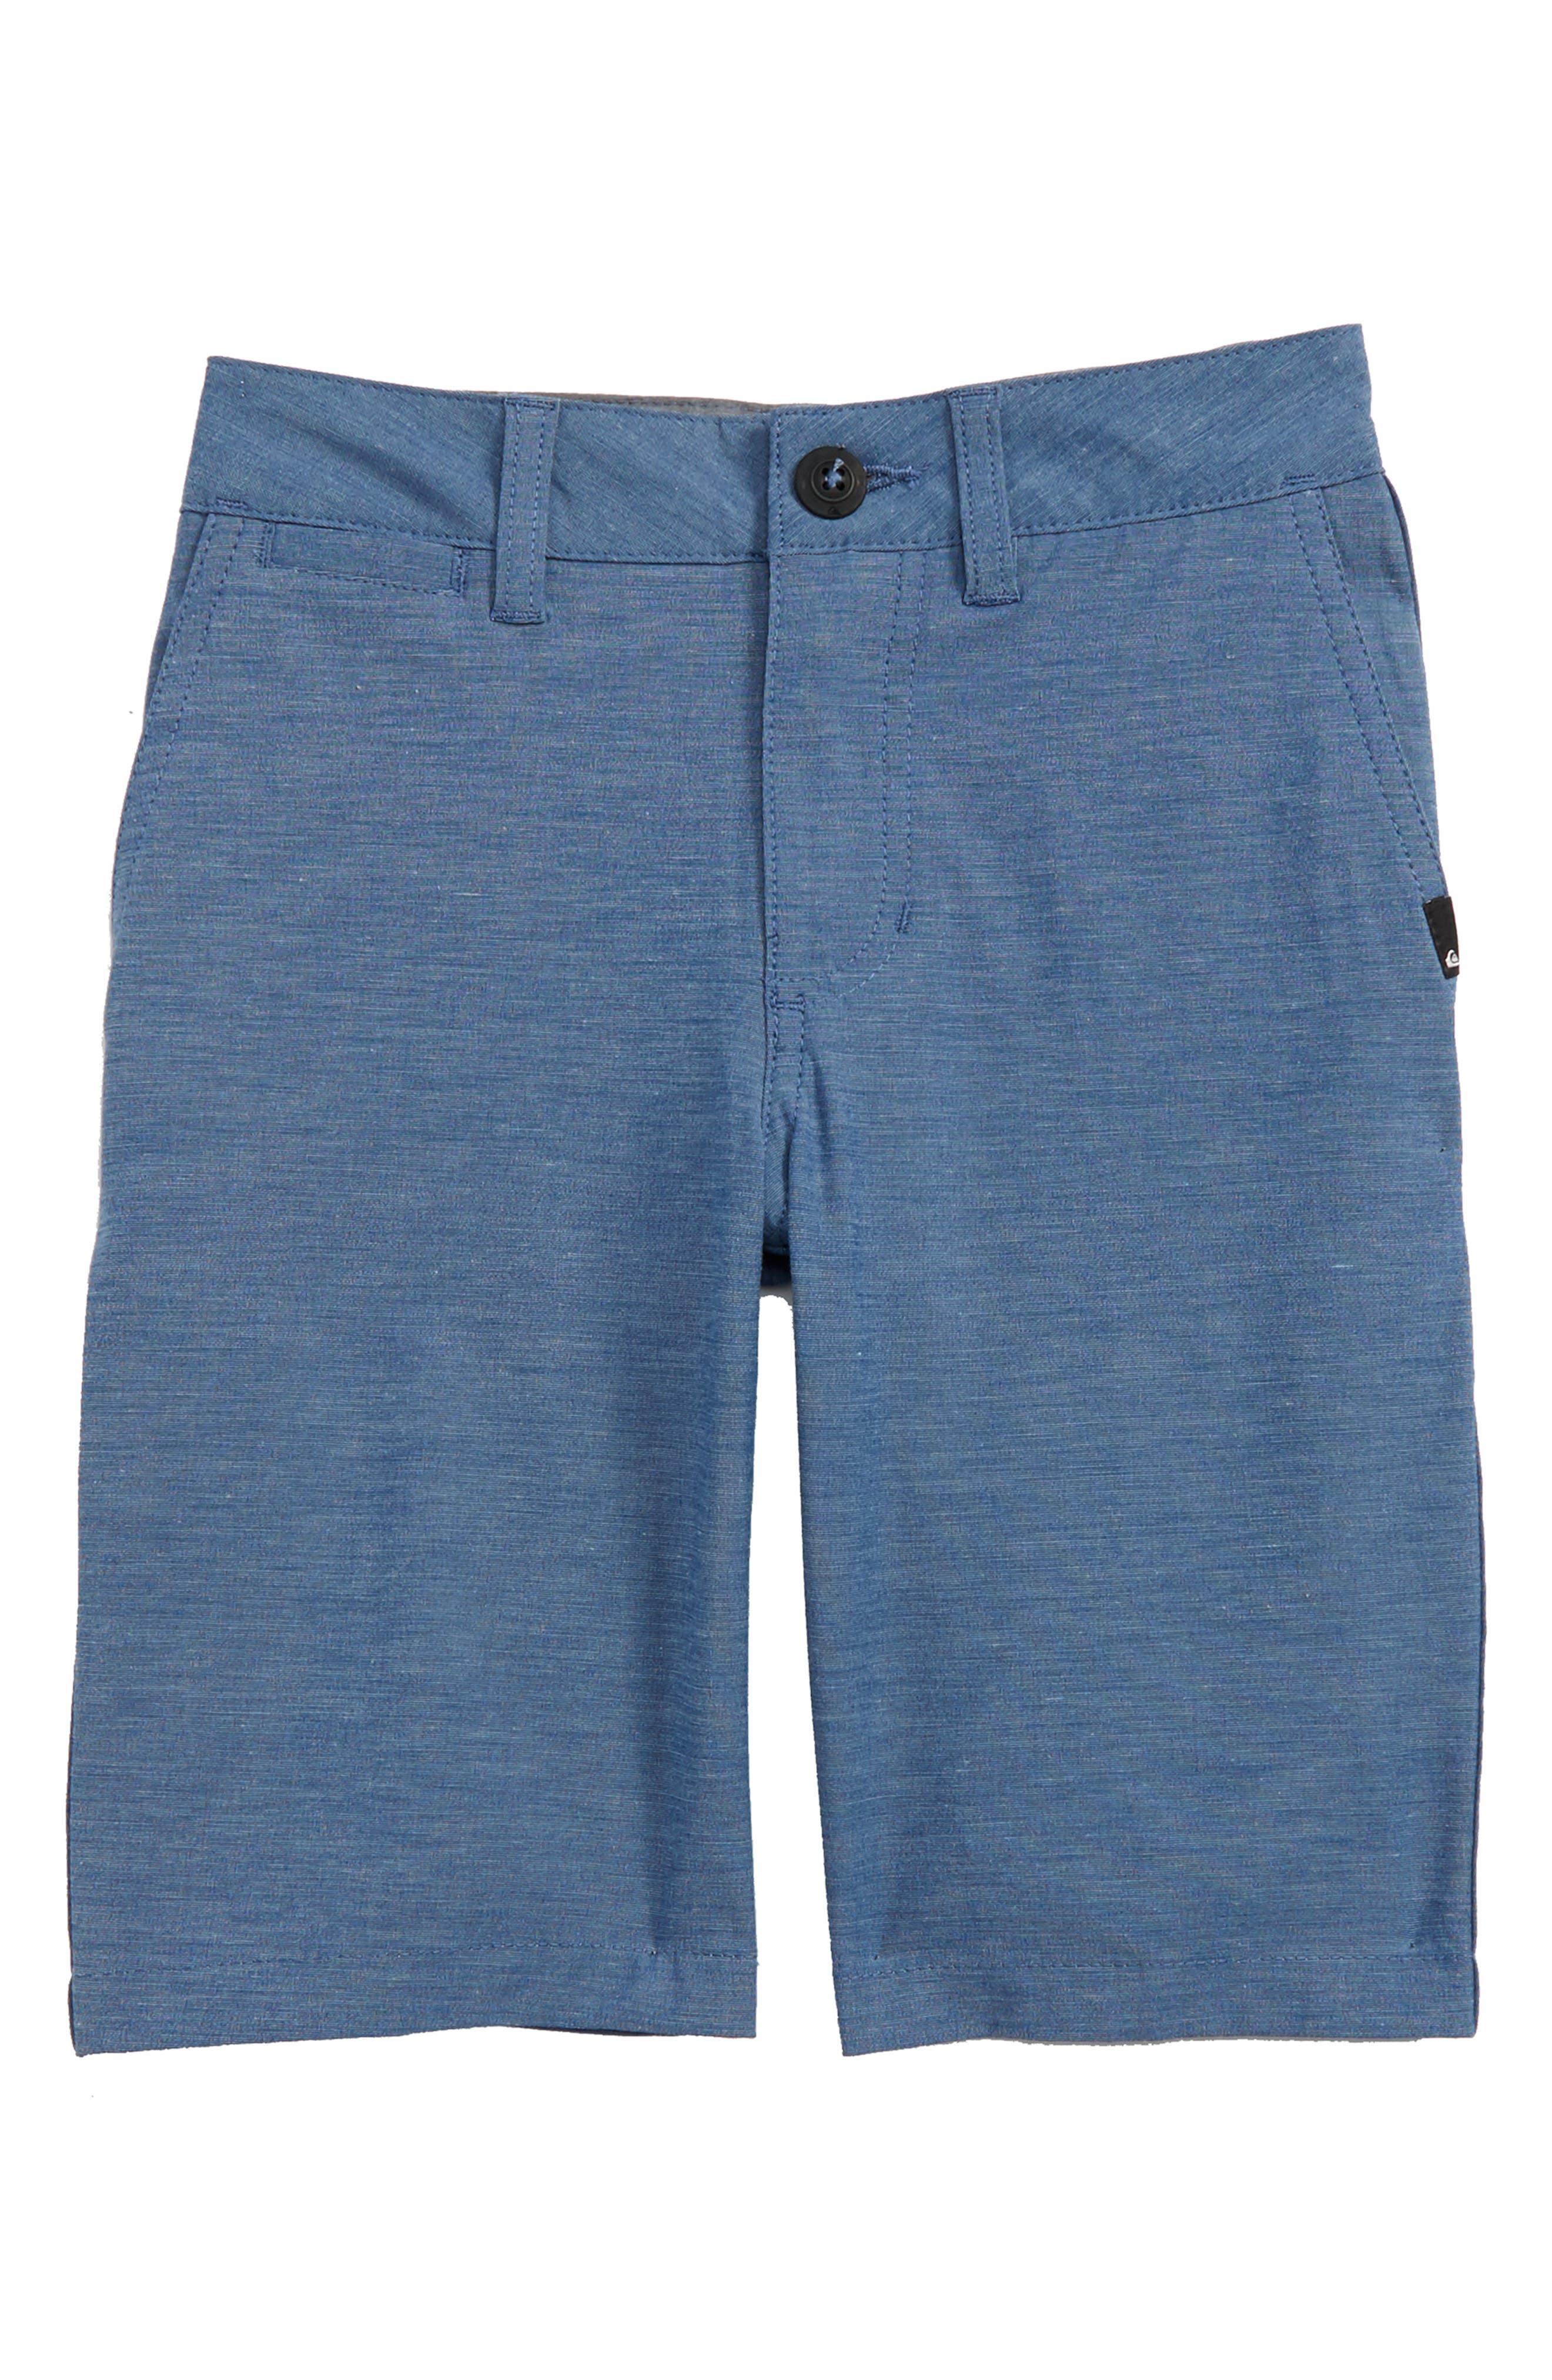 Amphibian Hybrid Shorts,                             Main thumbnail 5, color,